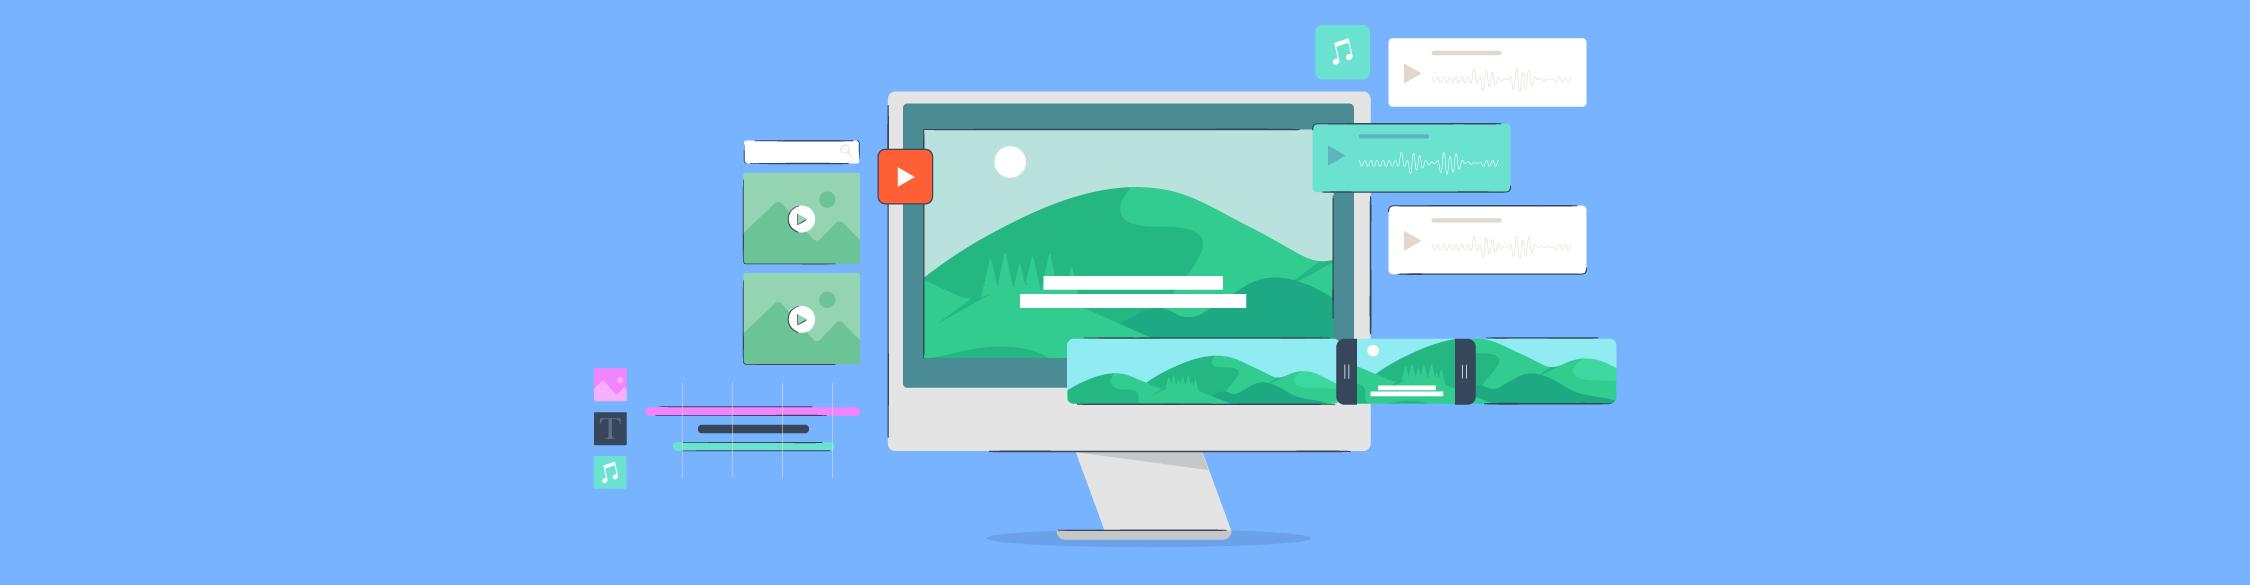 8 Best Movavi Alternatives for Easy Online Video Editing [2021]